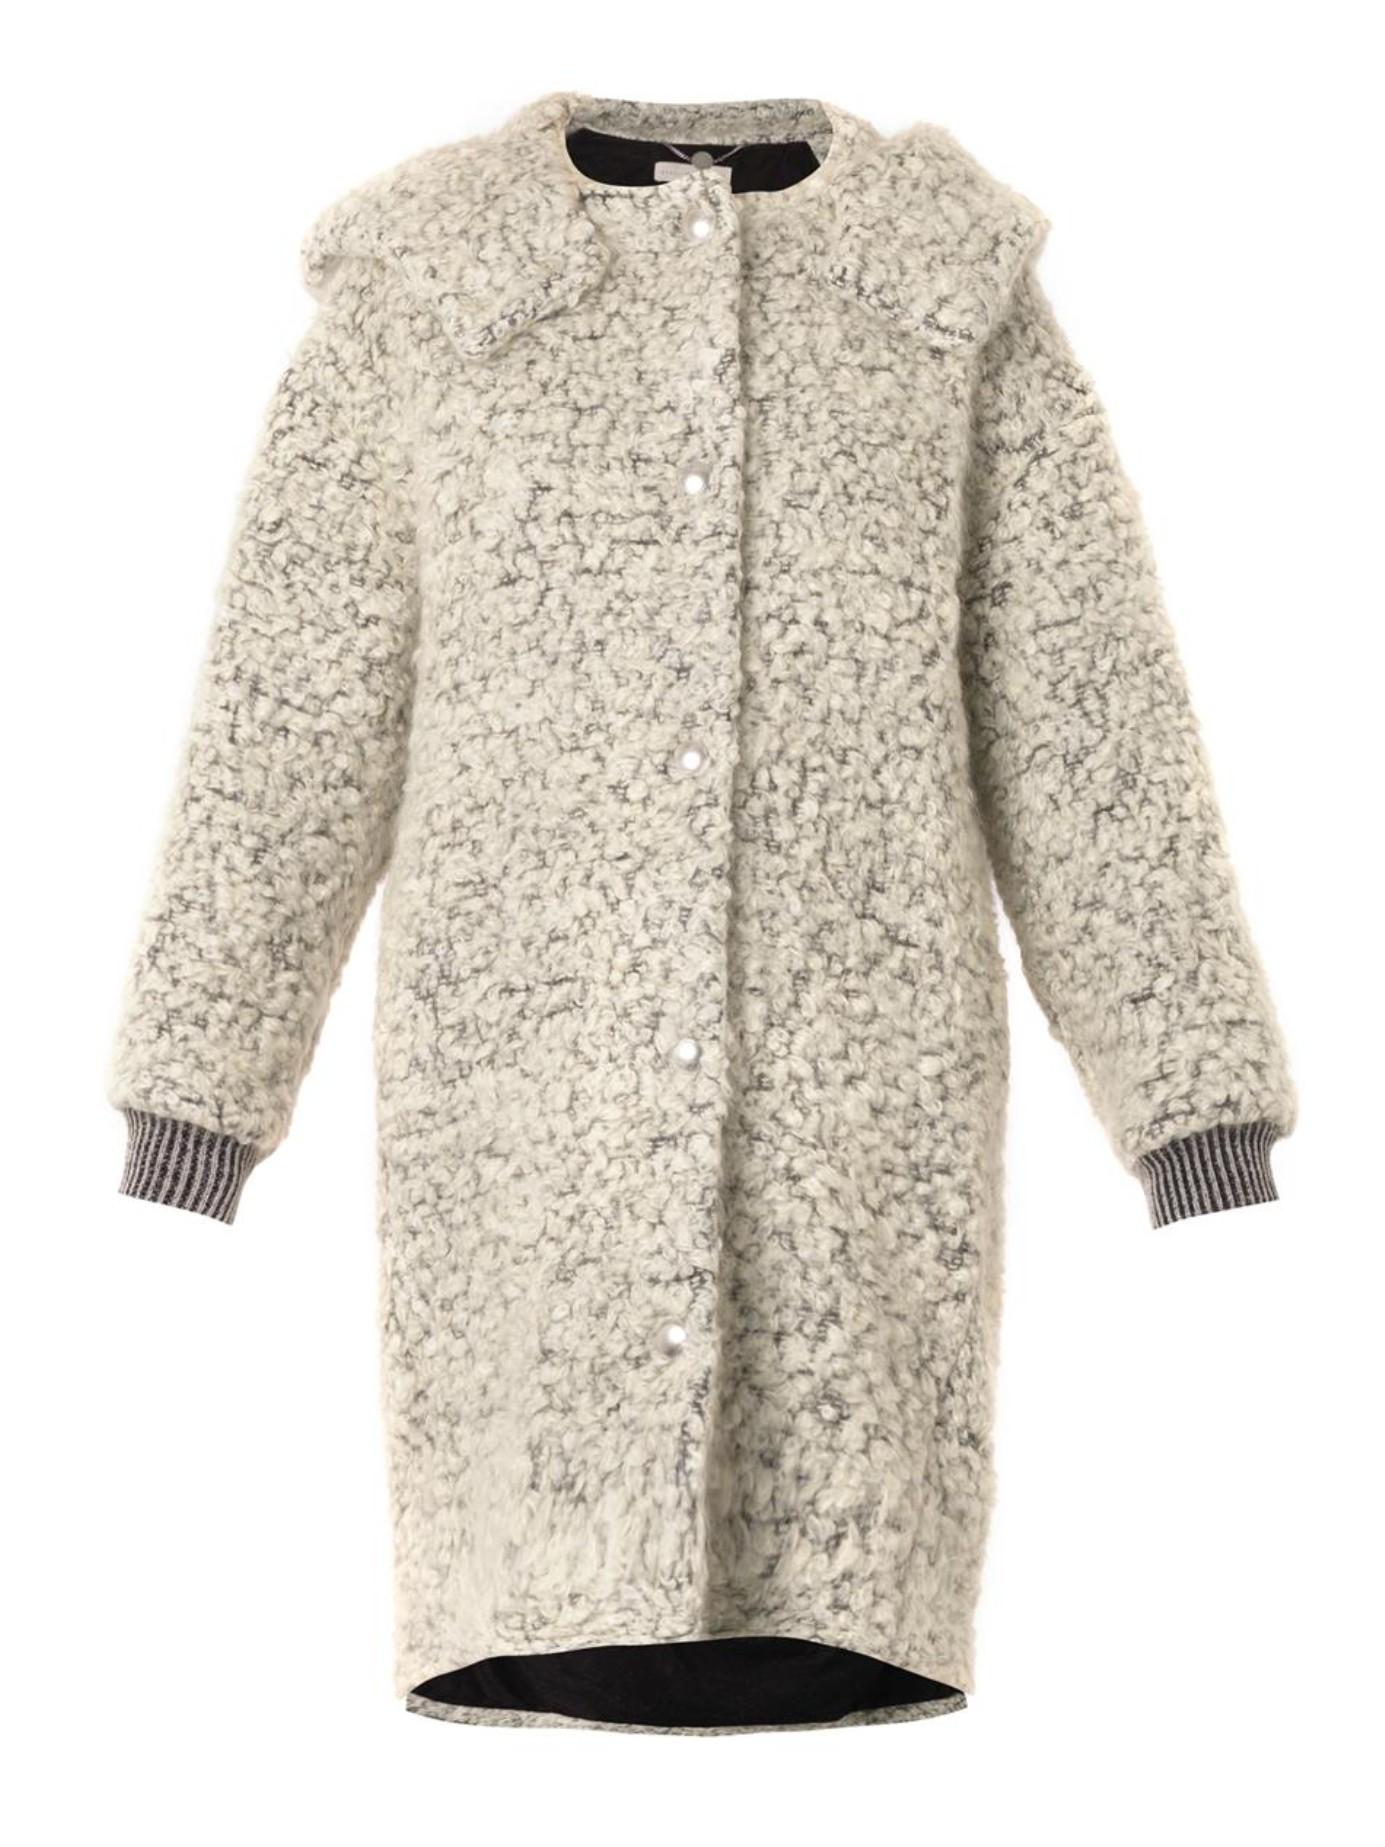 Stella mccartney Clara Mohair And Wool-blend Bouclé Coat in White